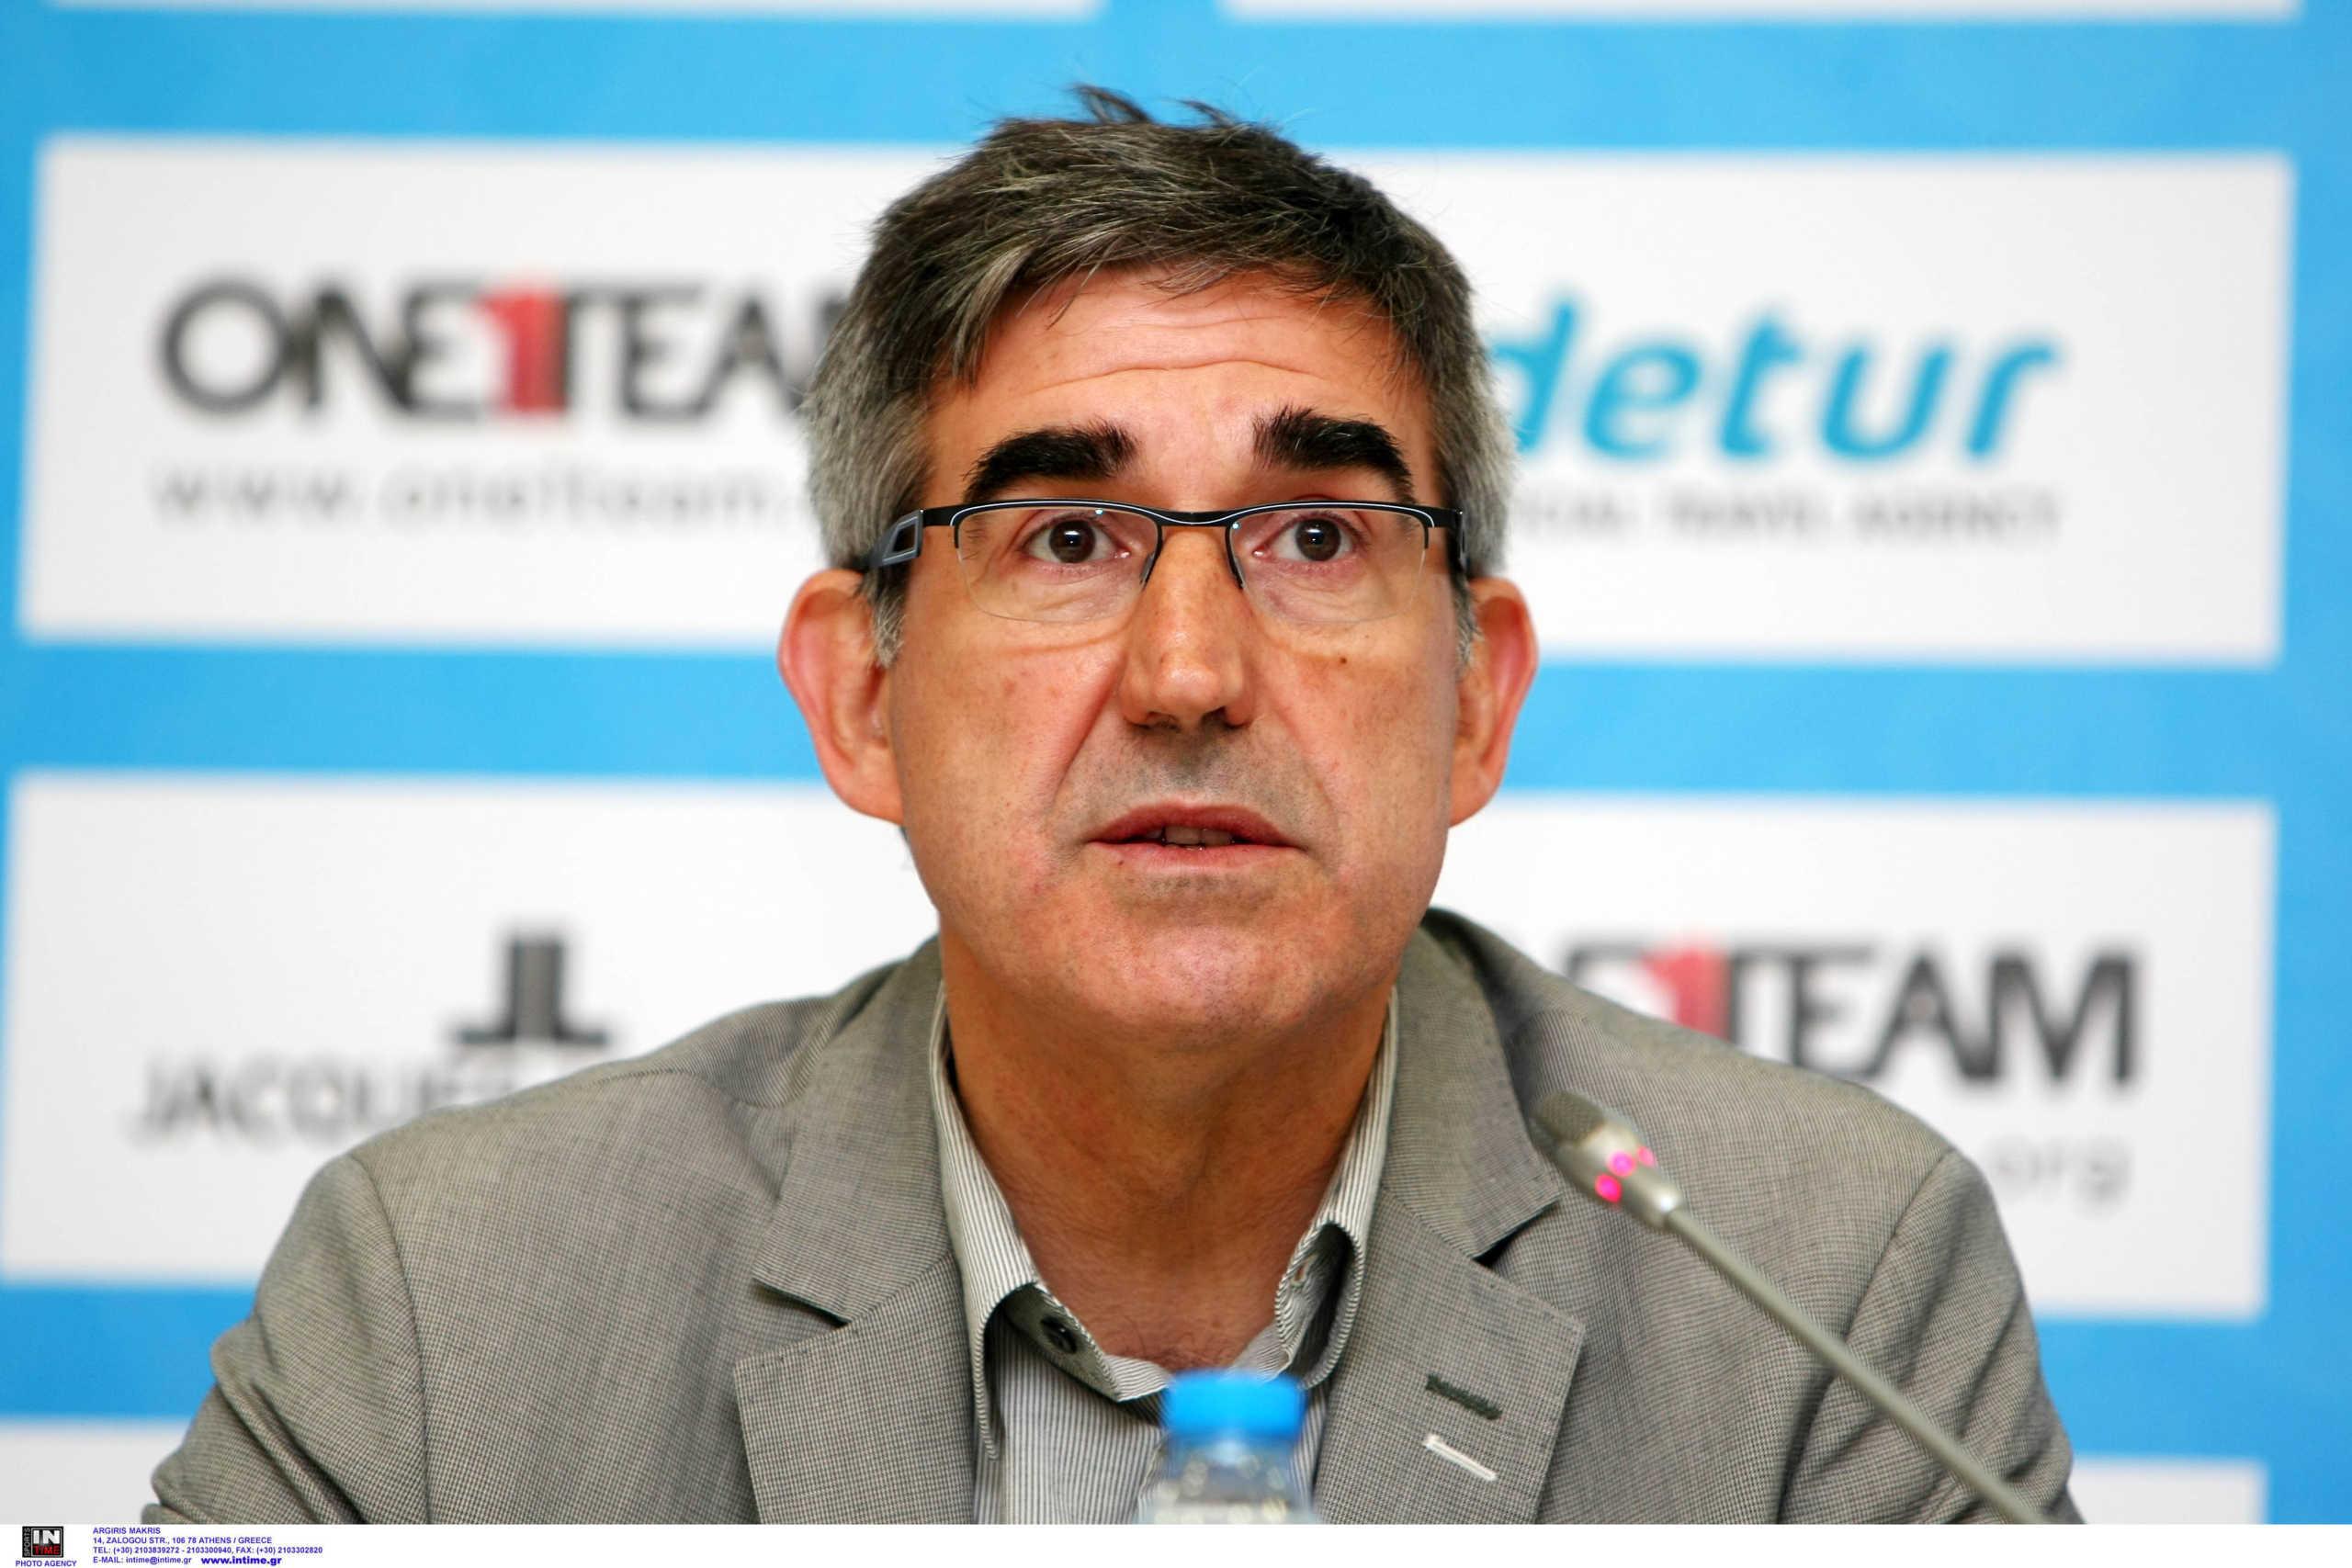 Euroleague: Ο Μπερτομέου κάλεσε έκτακτο συμβούλιο μέσα στον Απρίλιο